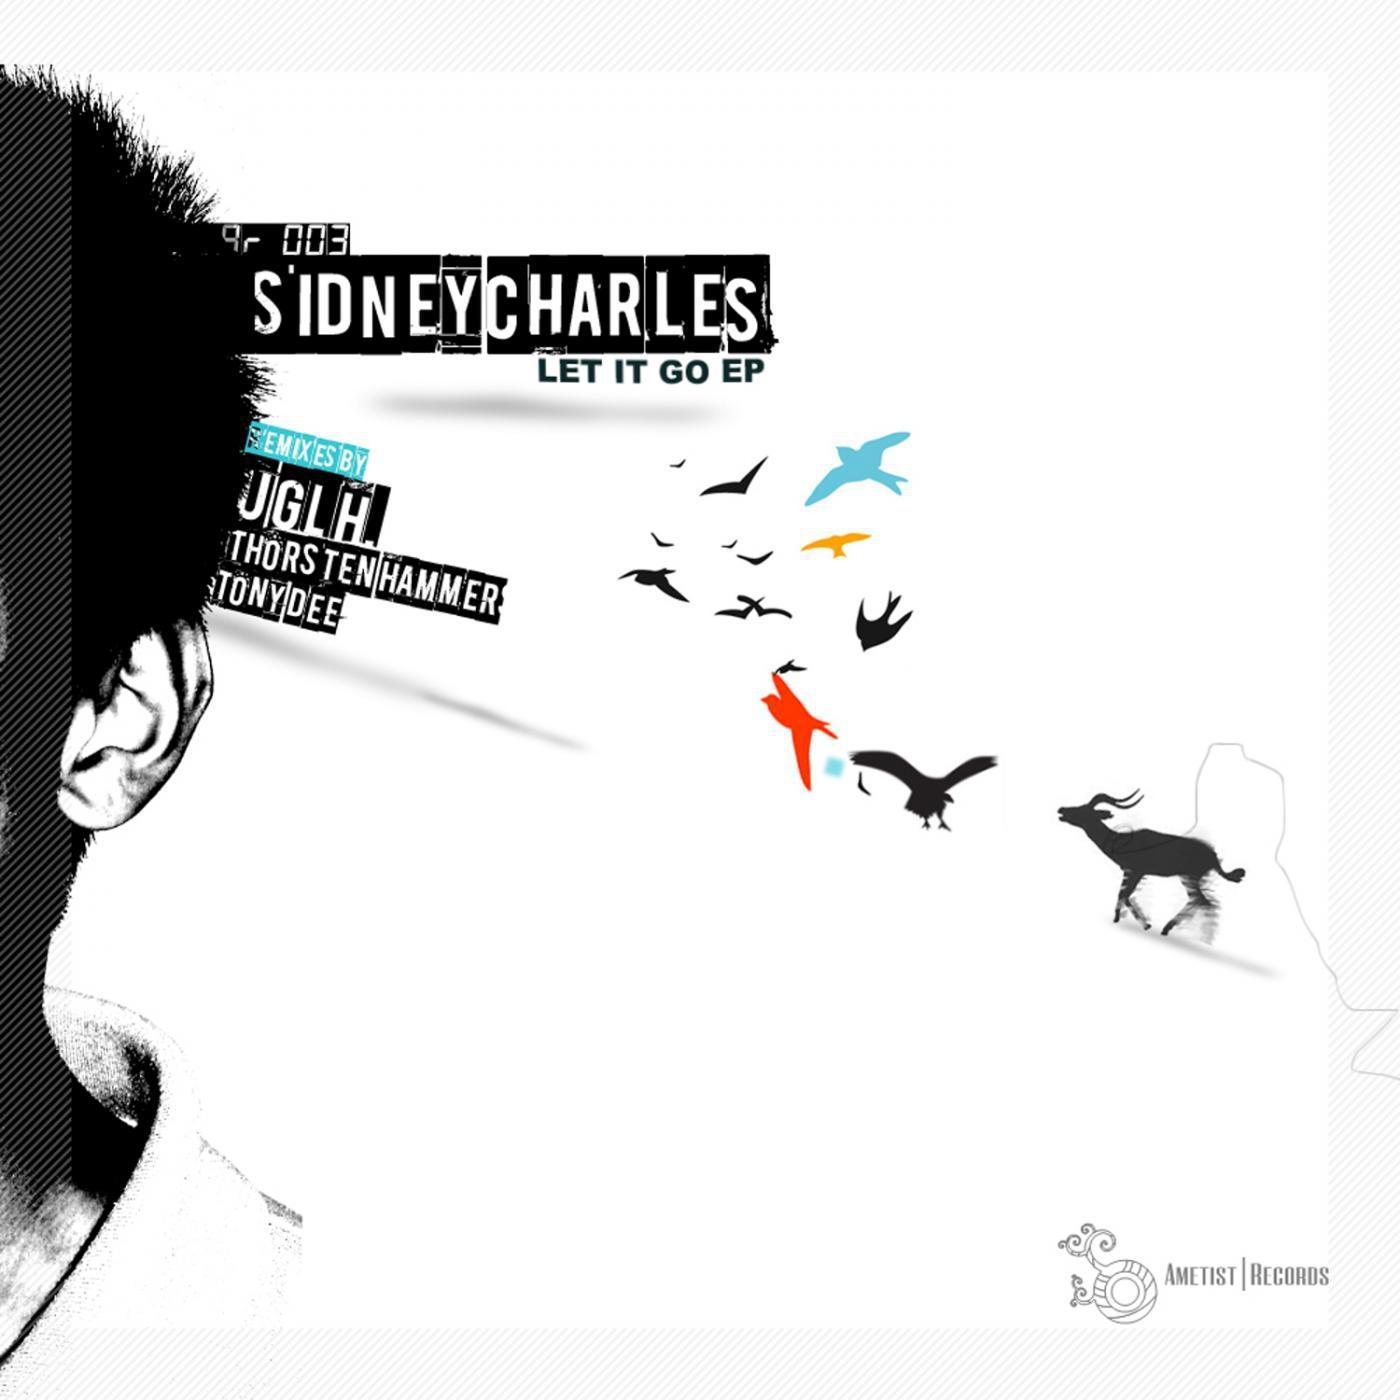 Sidney Charles - Let It Go (Thorsten Hammer Remix)